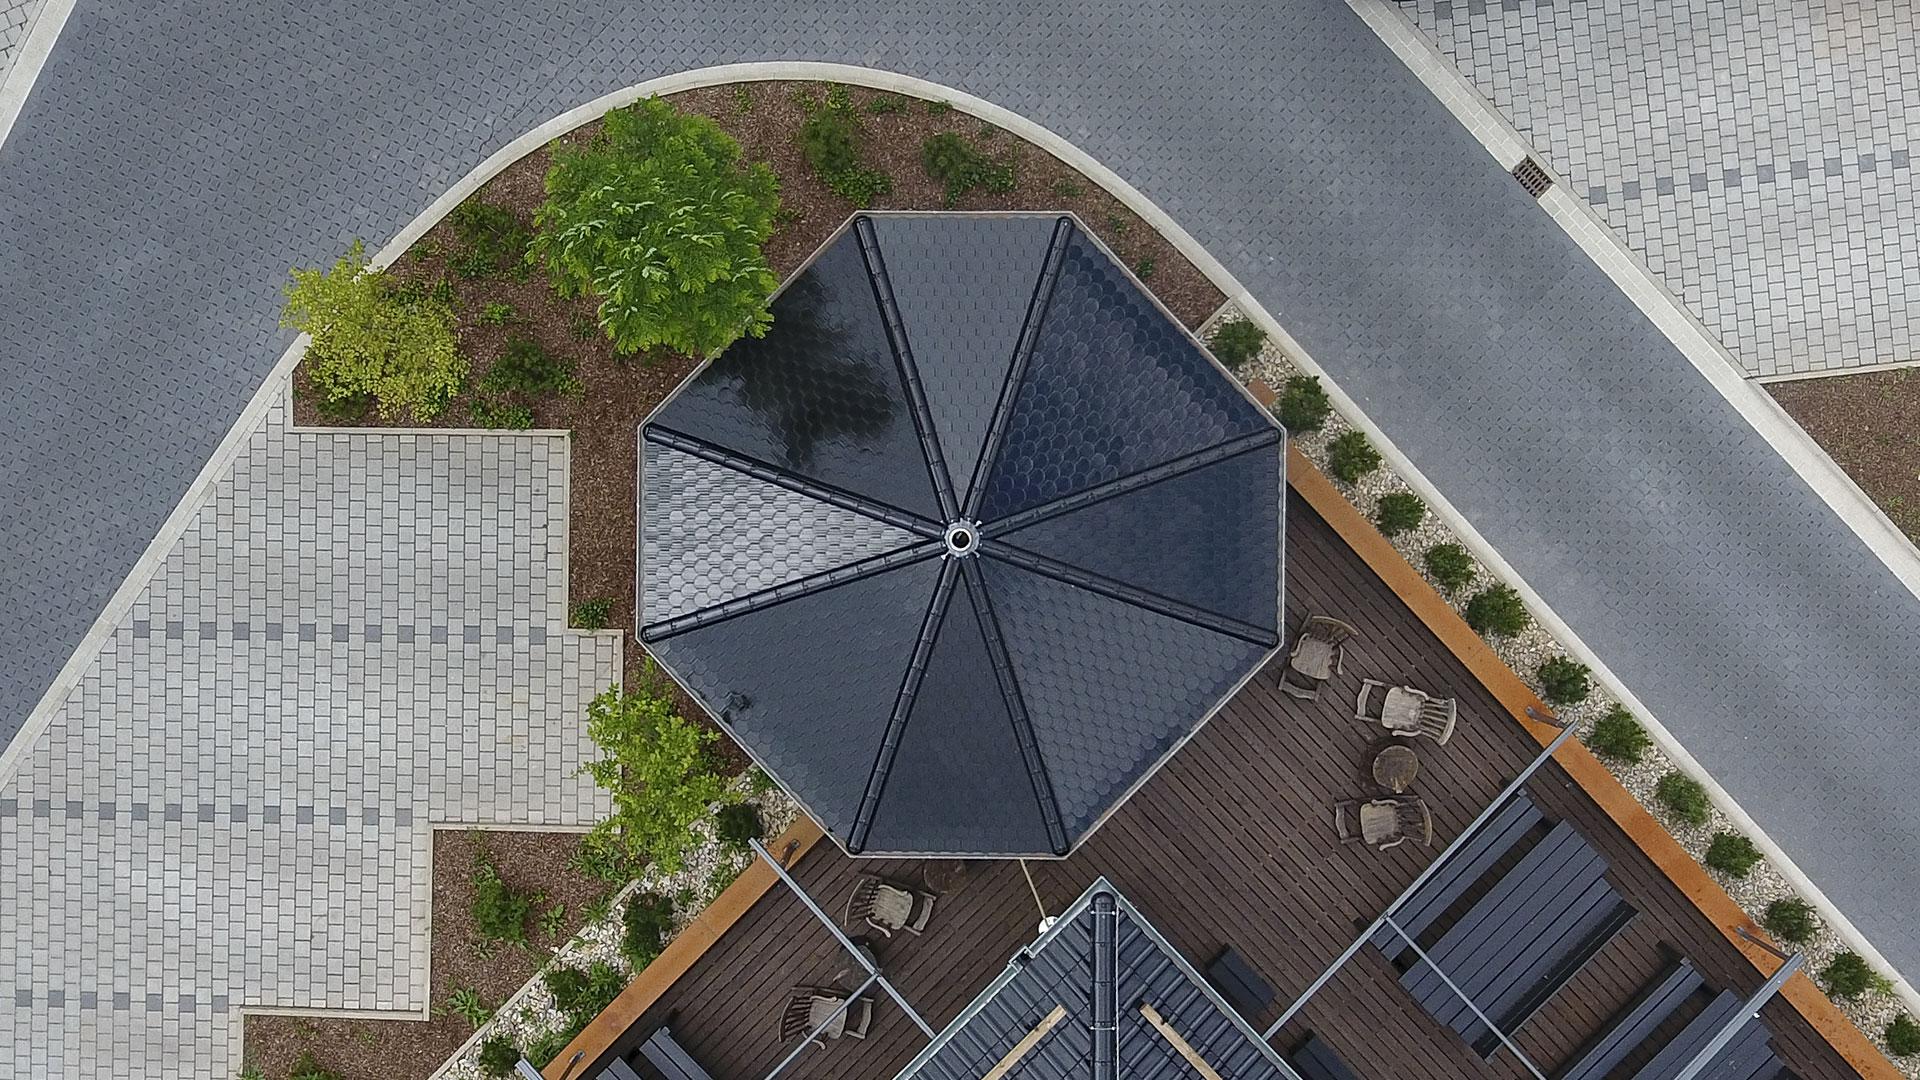 Architekturfotografie, Drohne: Dach Pavillon | Foto: Dieter Eikenberg, imprints